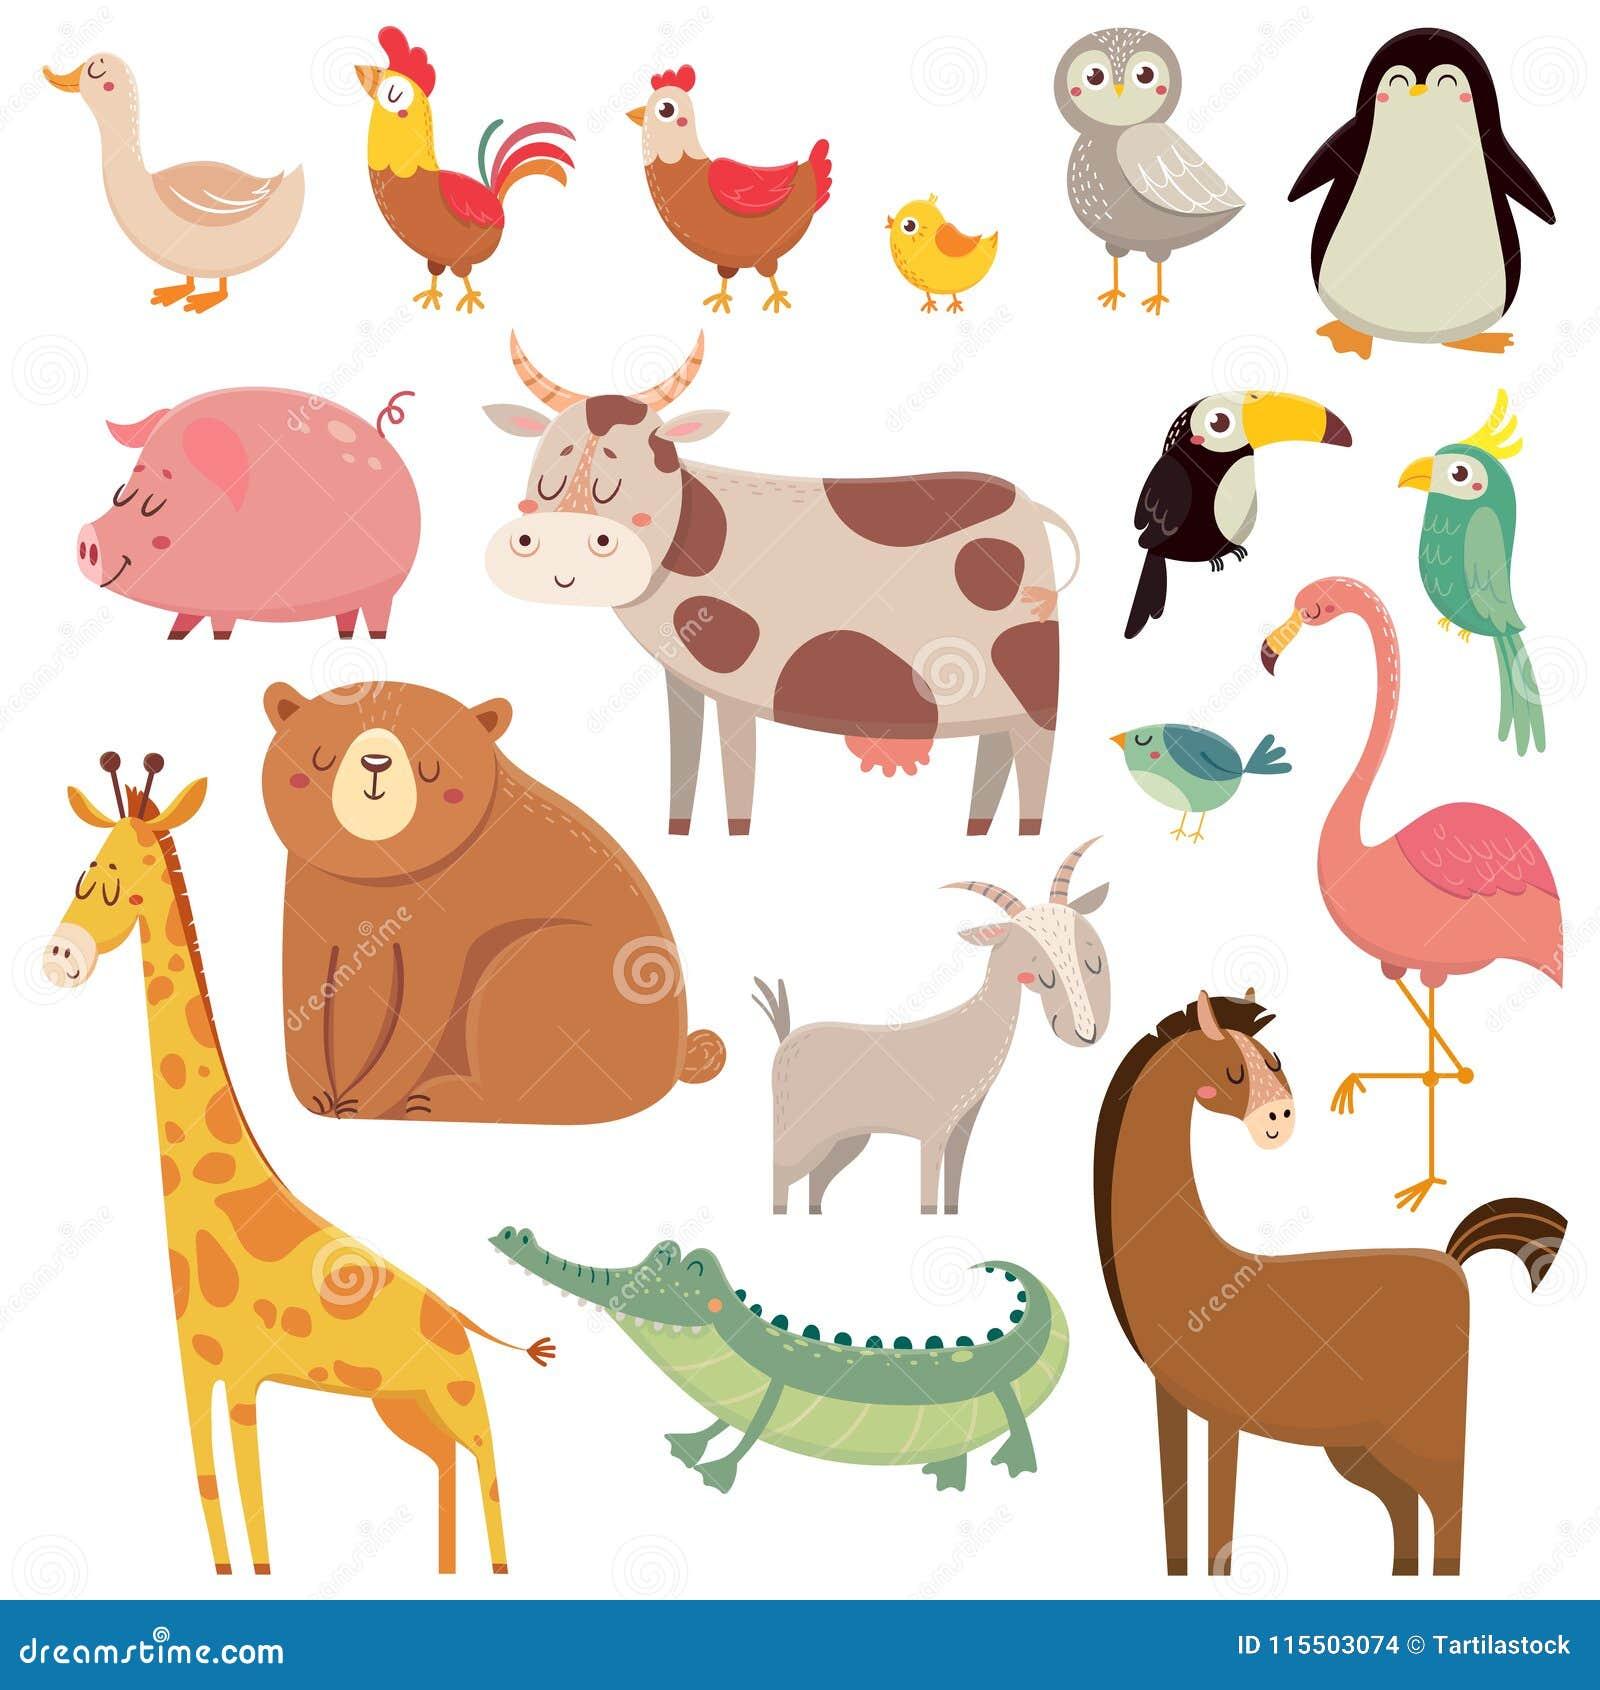 Baby cartoons wild bear, giraffe, crocodile, bird and domestic a